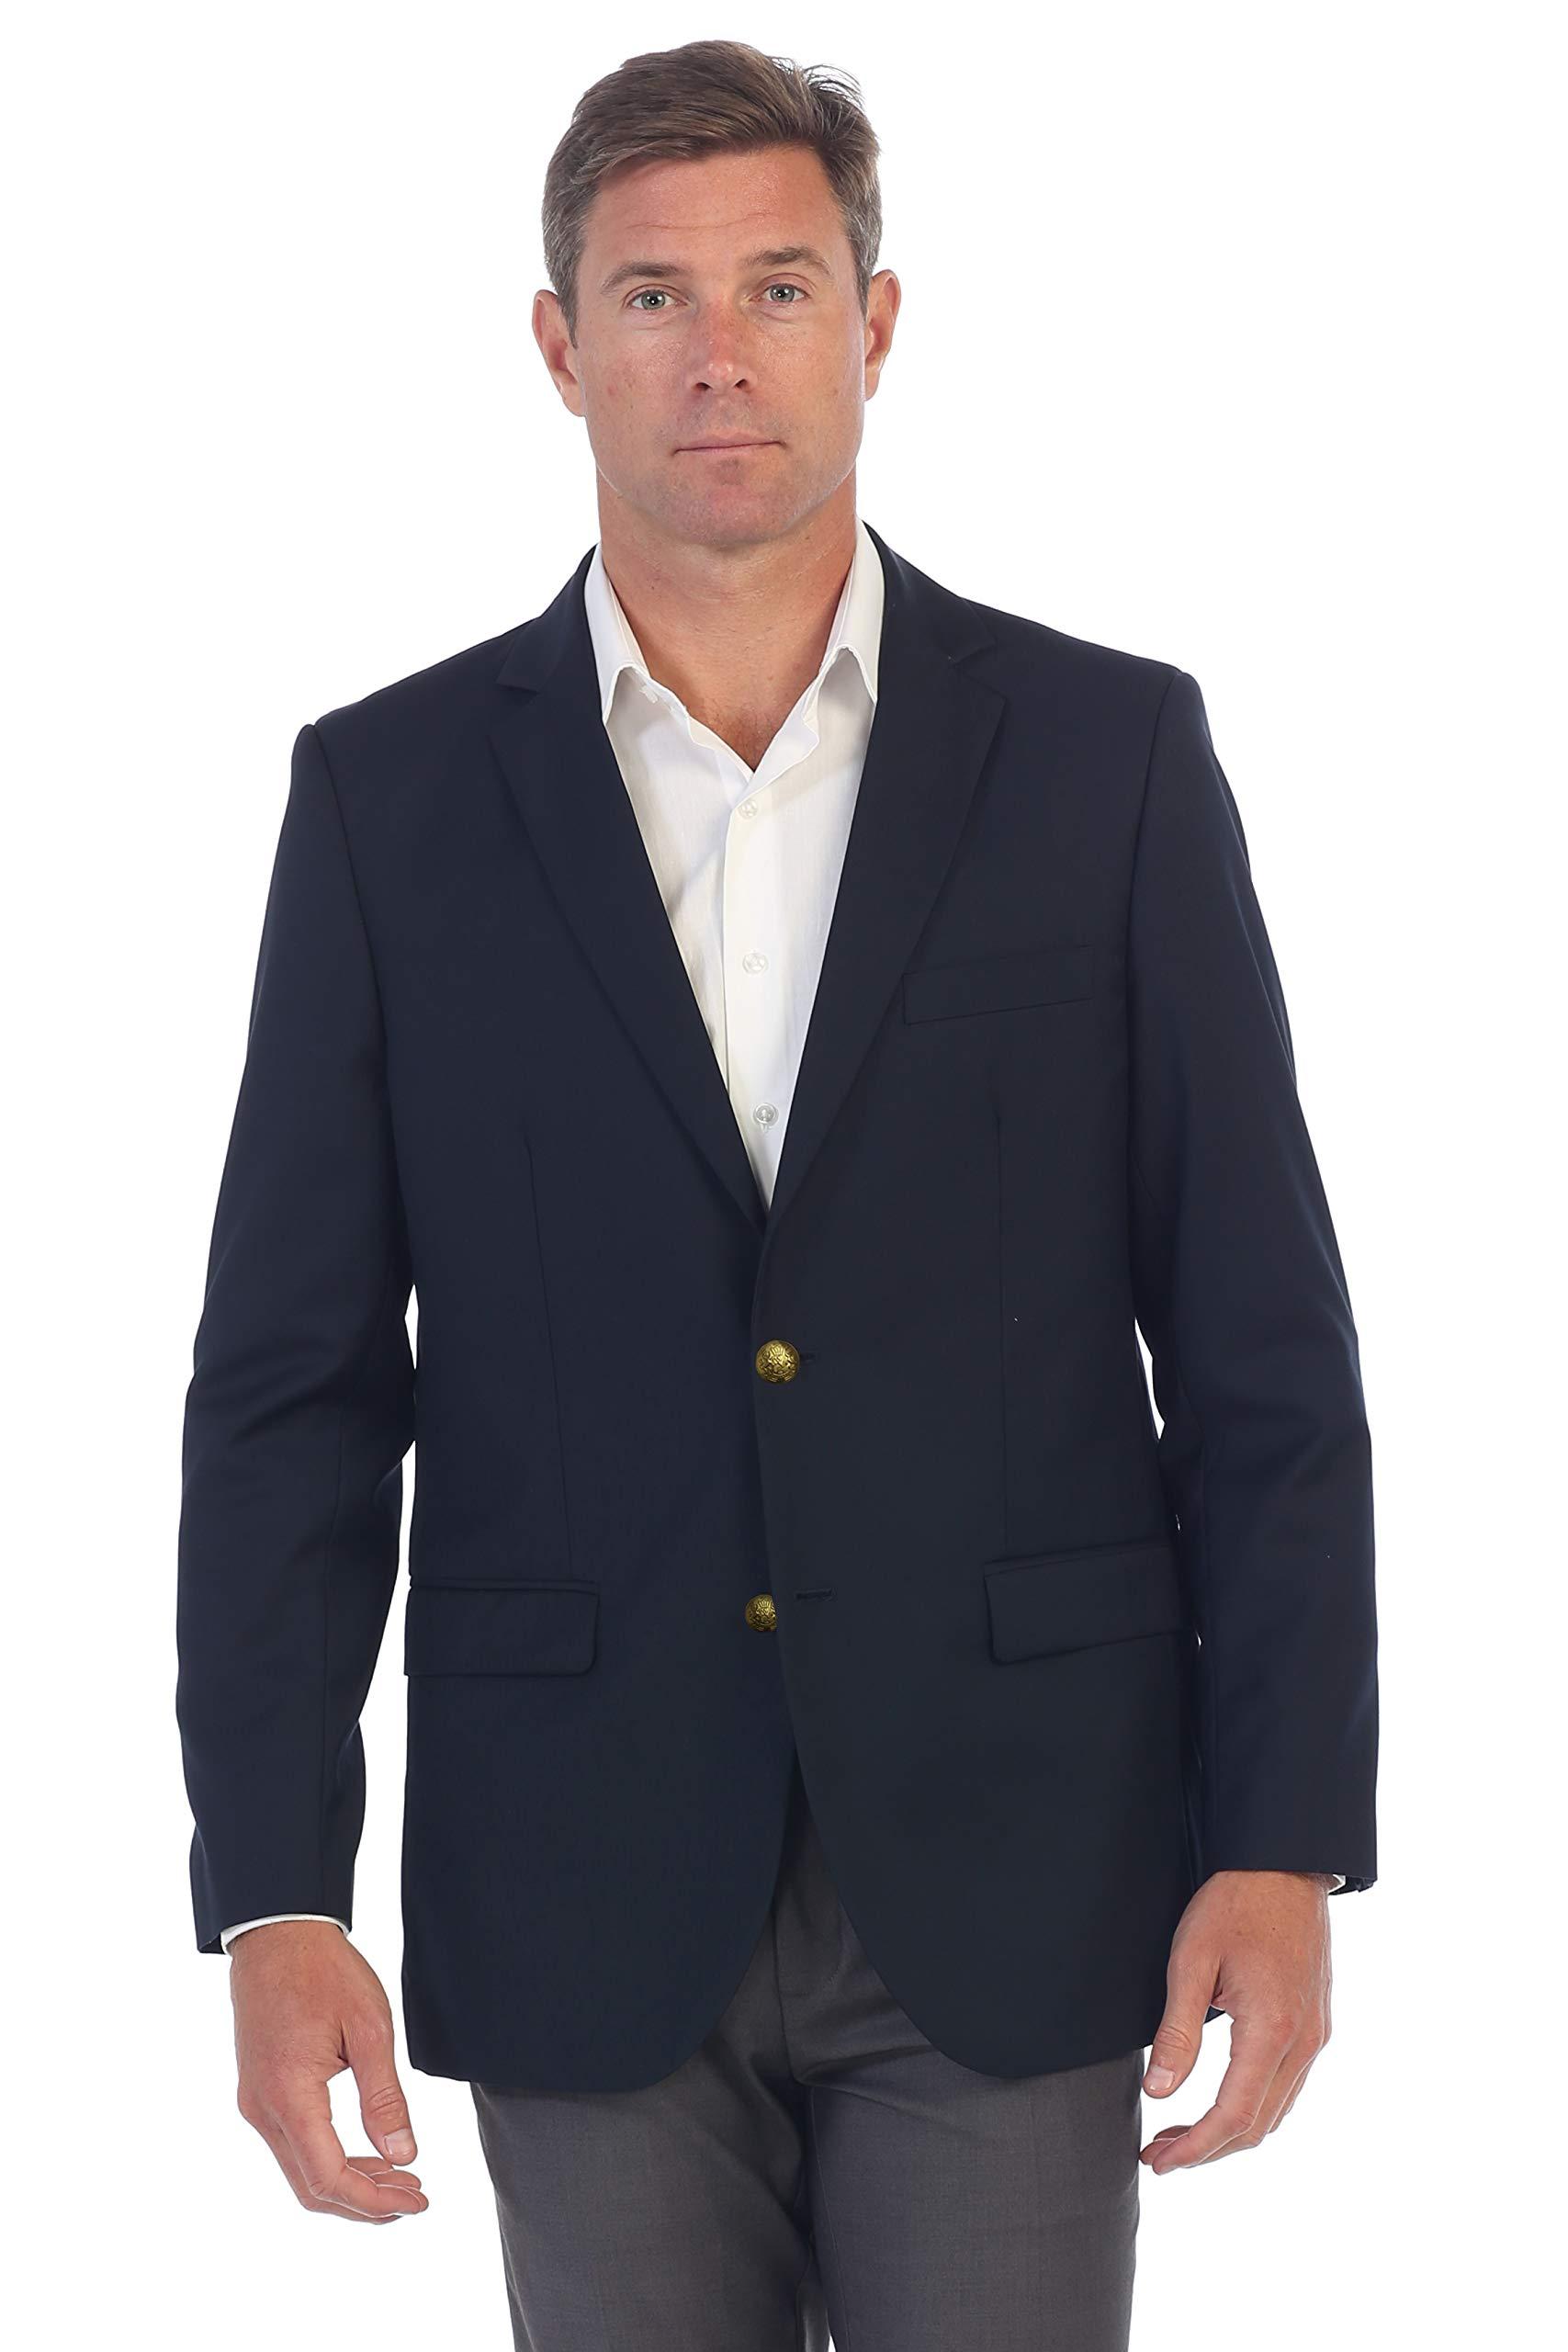 Gioberti Mens Formal Navy Blazer Jacket, Size 44 Regular by Gioberti